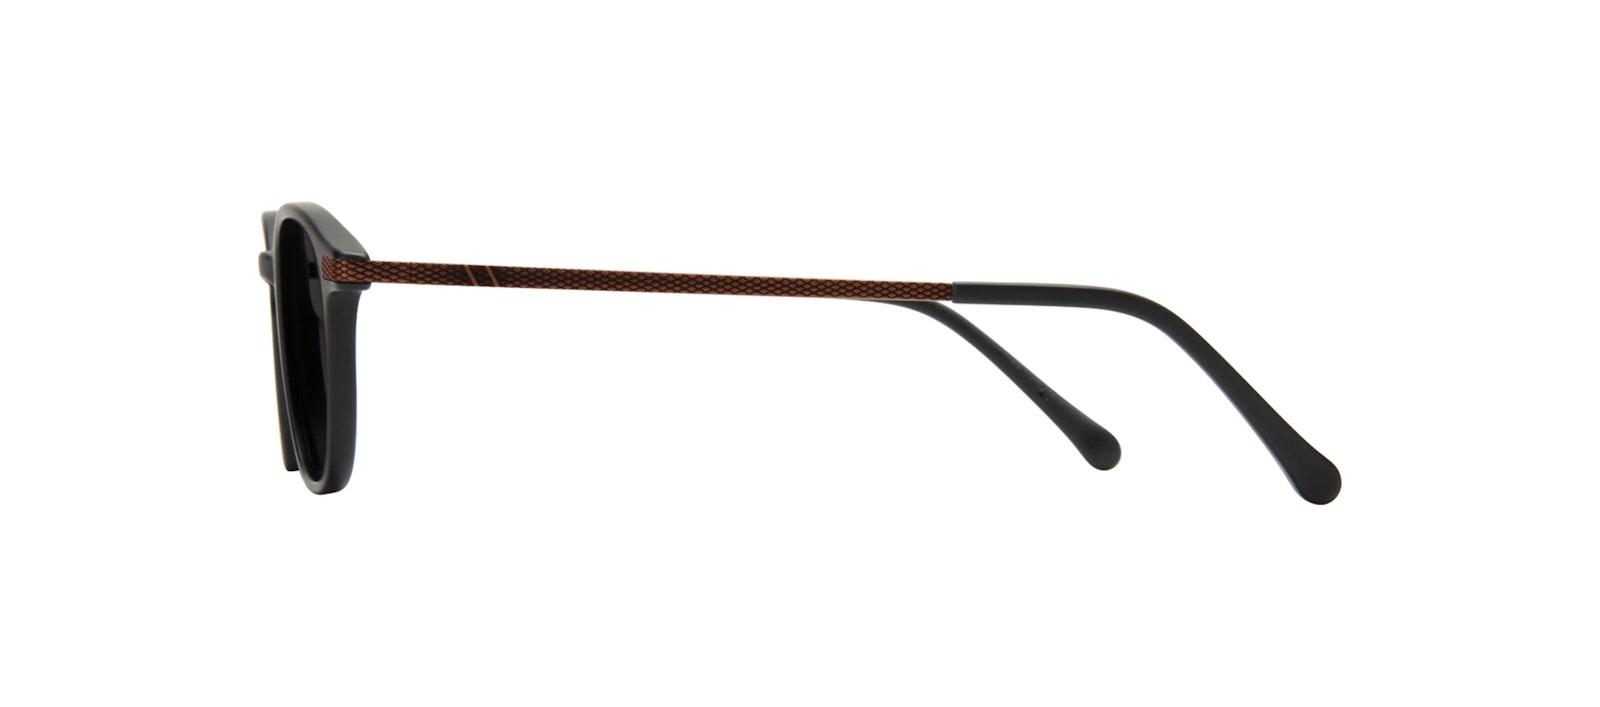 Affordable Fashion Glasses Round Sunglasses Men Tux Onyx Matte Side